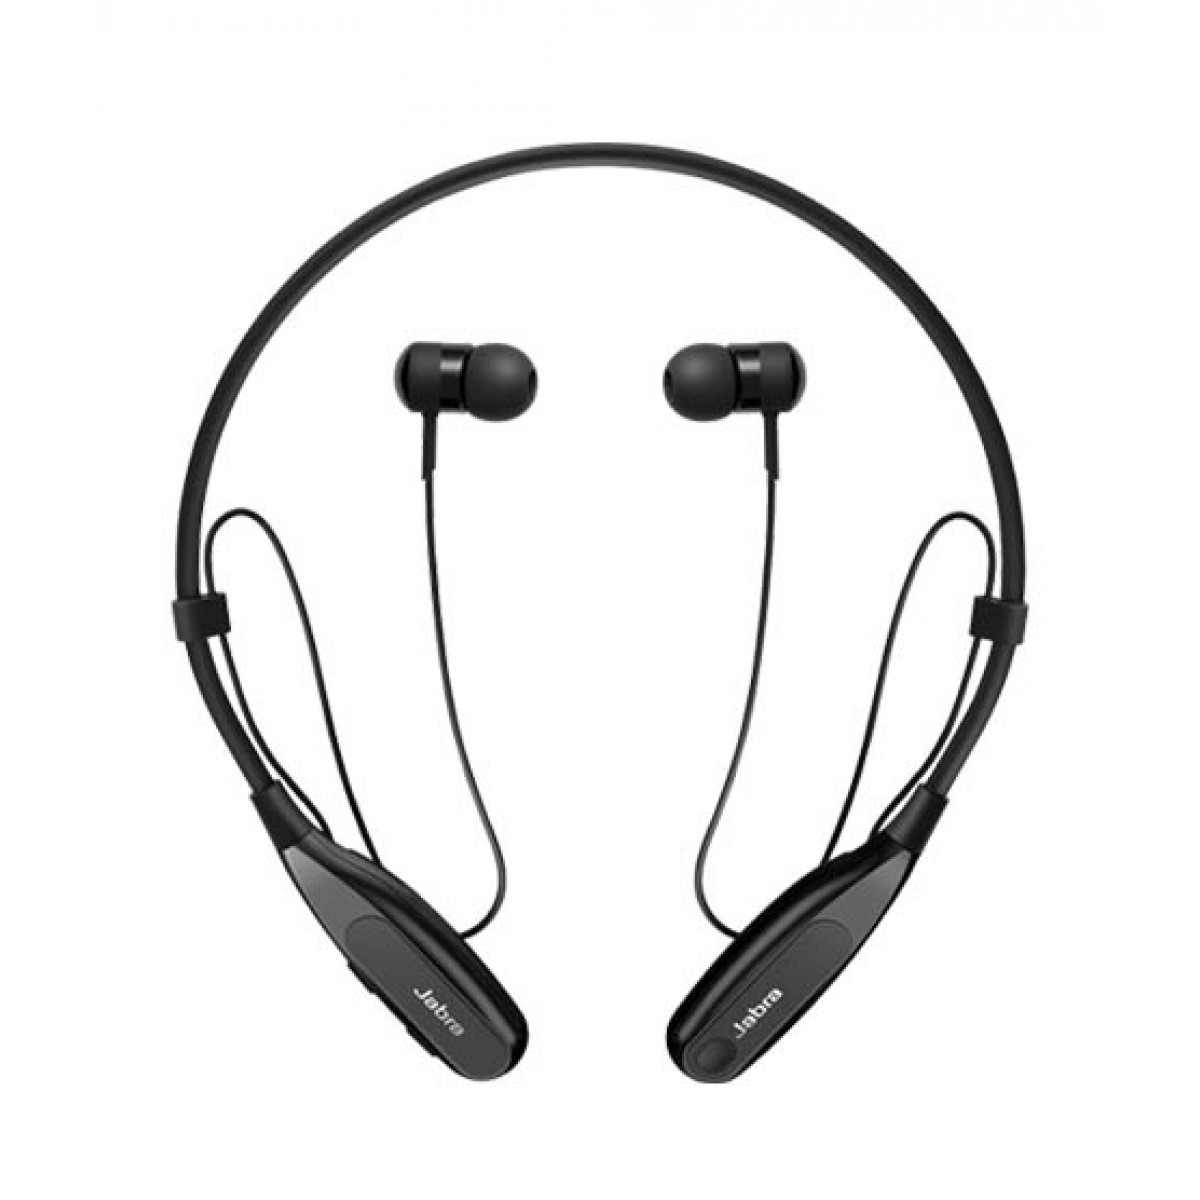 Bluetooth Jabra FUSION hudební HF sada, černá